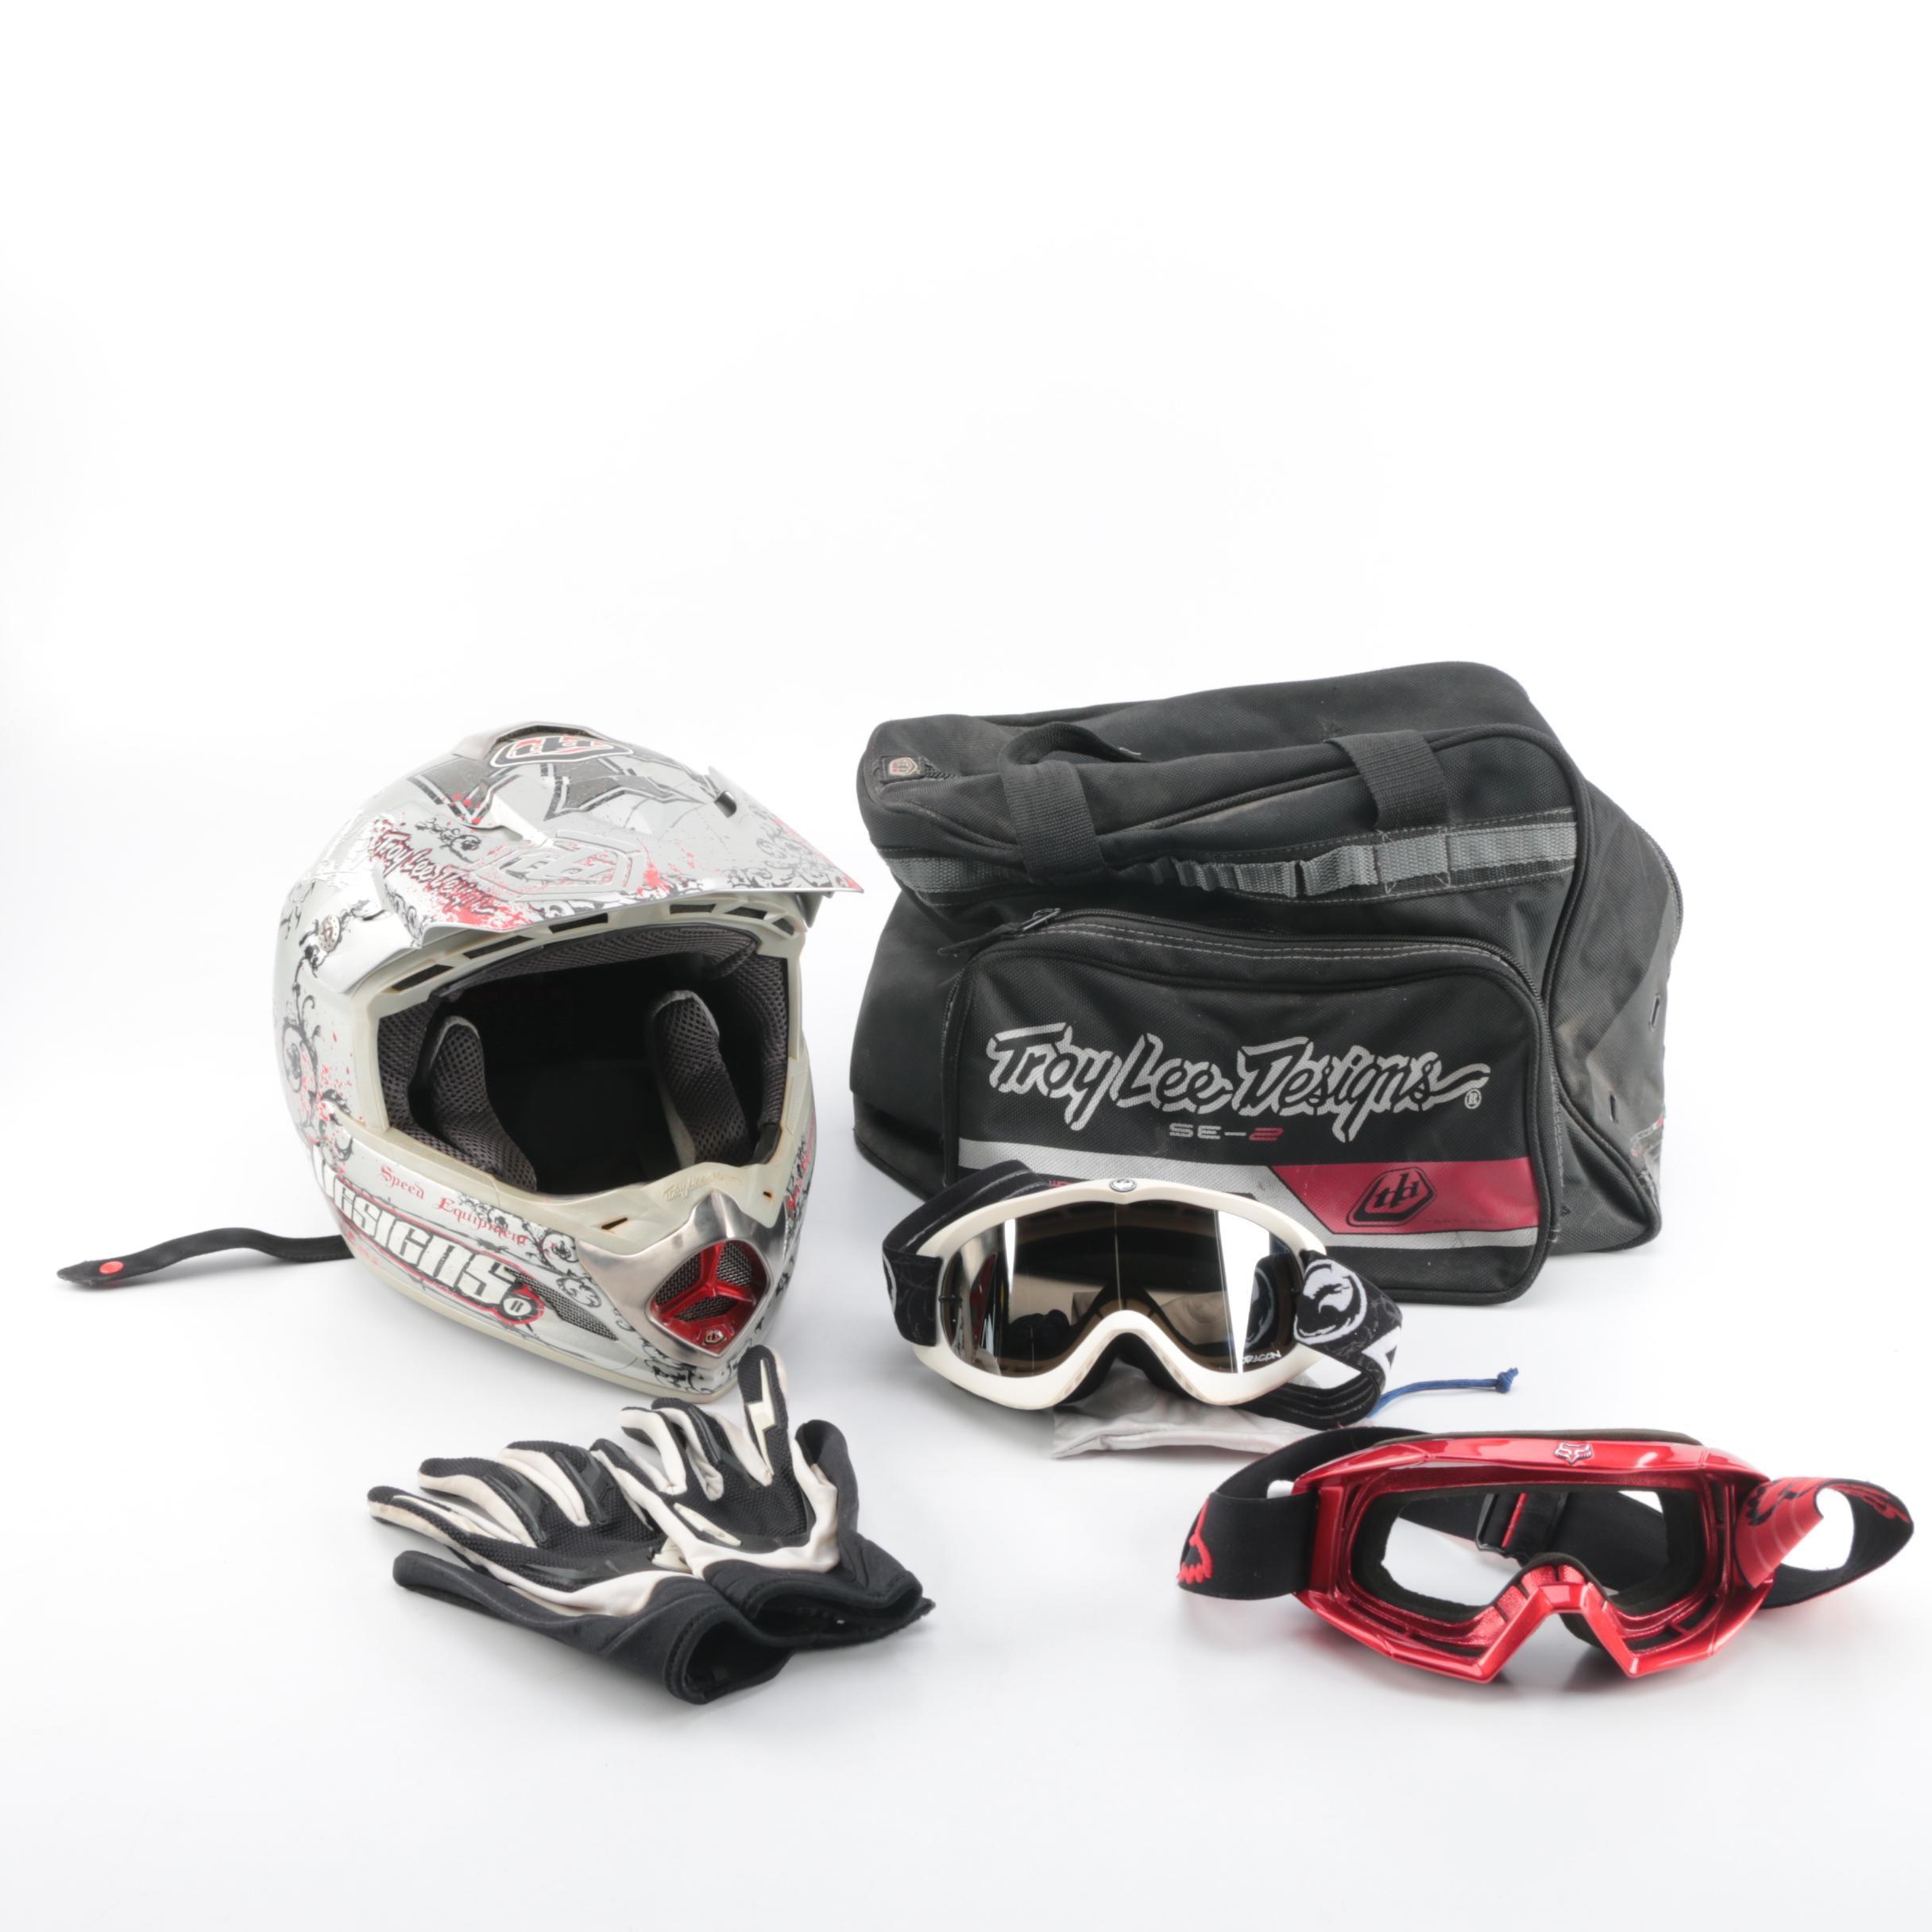 Troy Lee Designs Motocross Helmet with Accessories